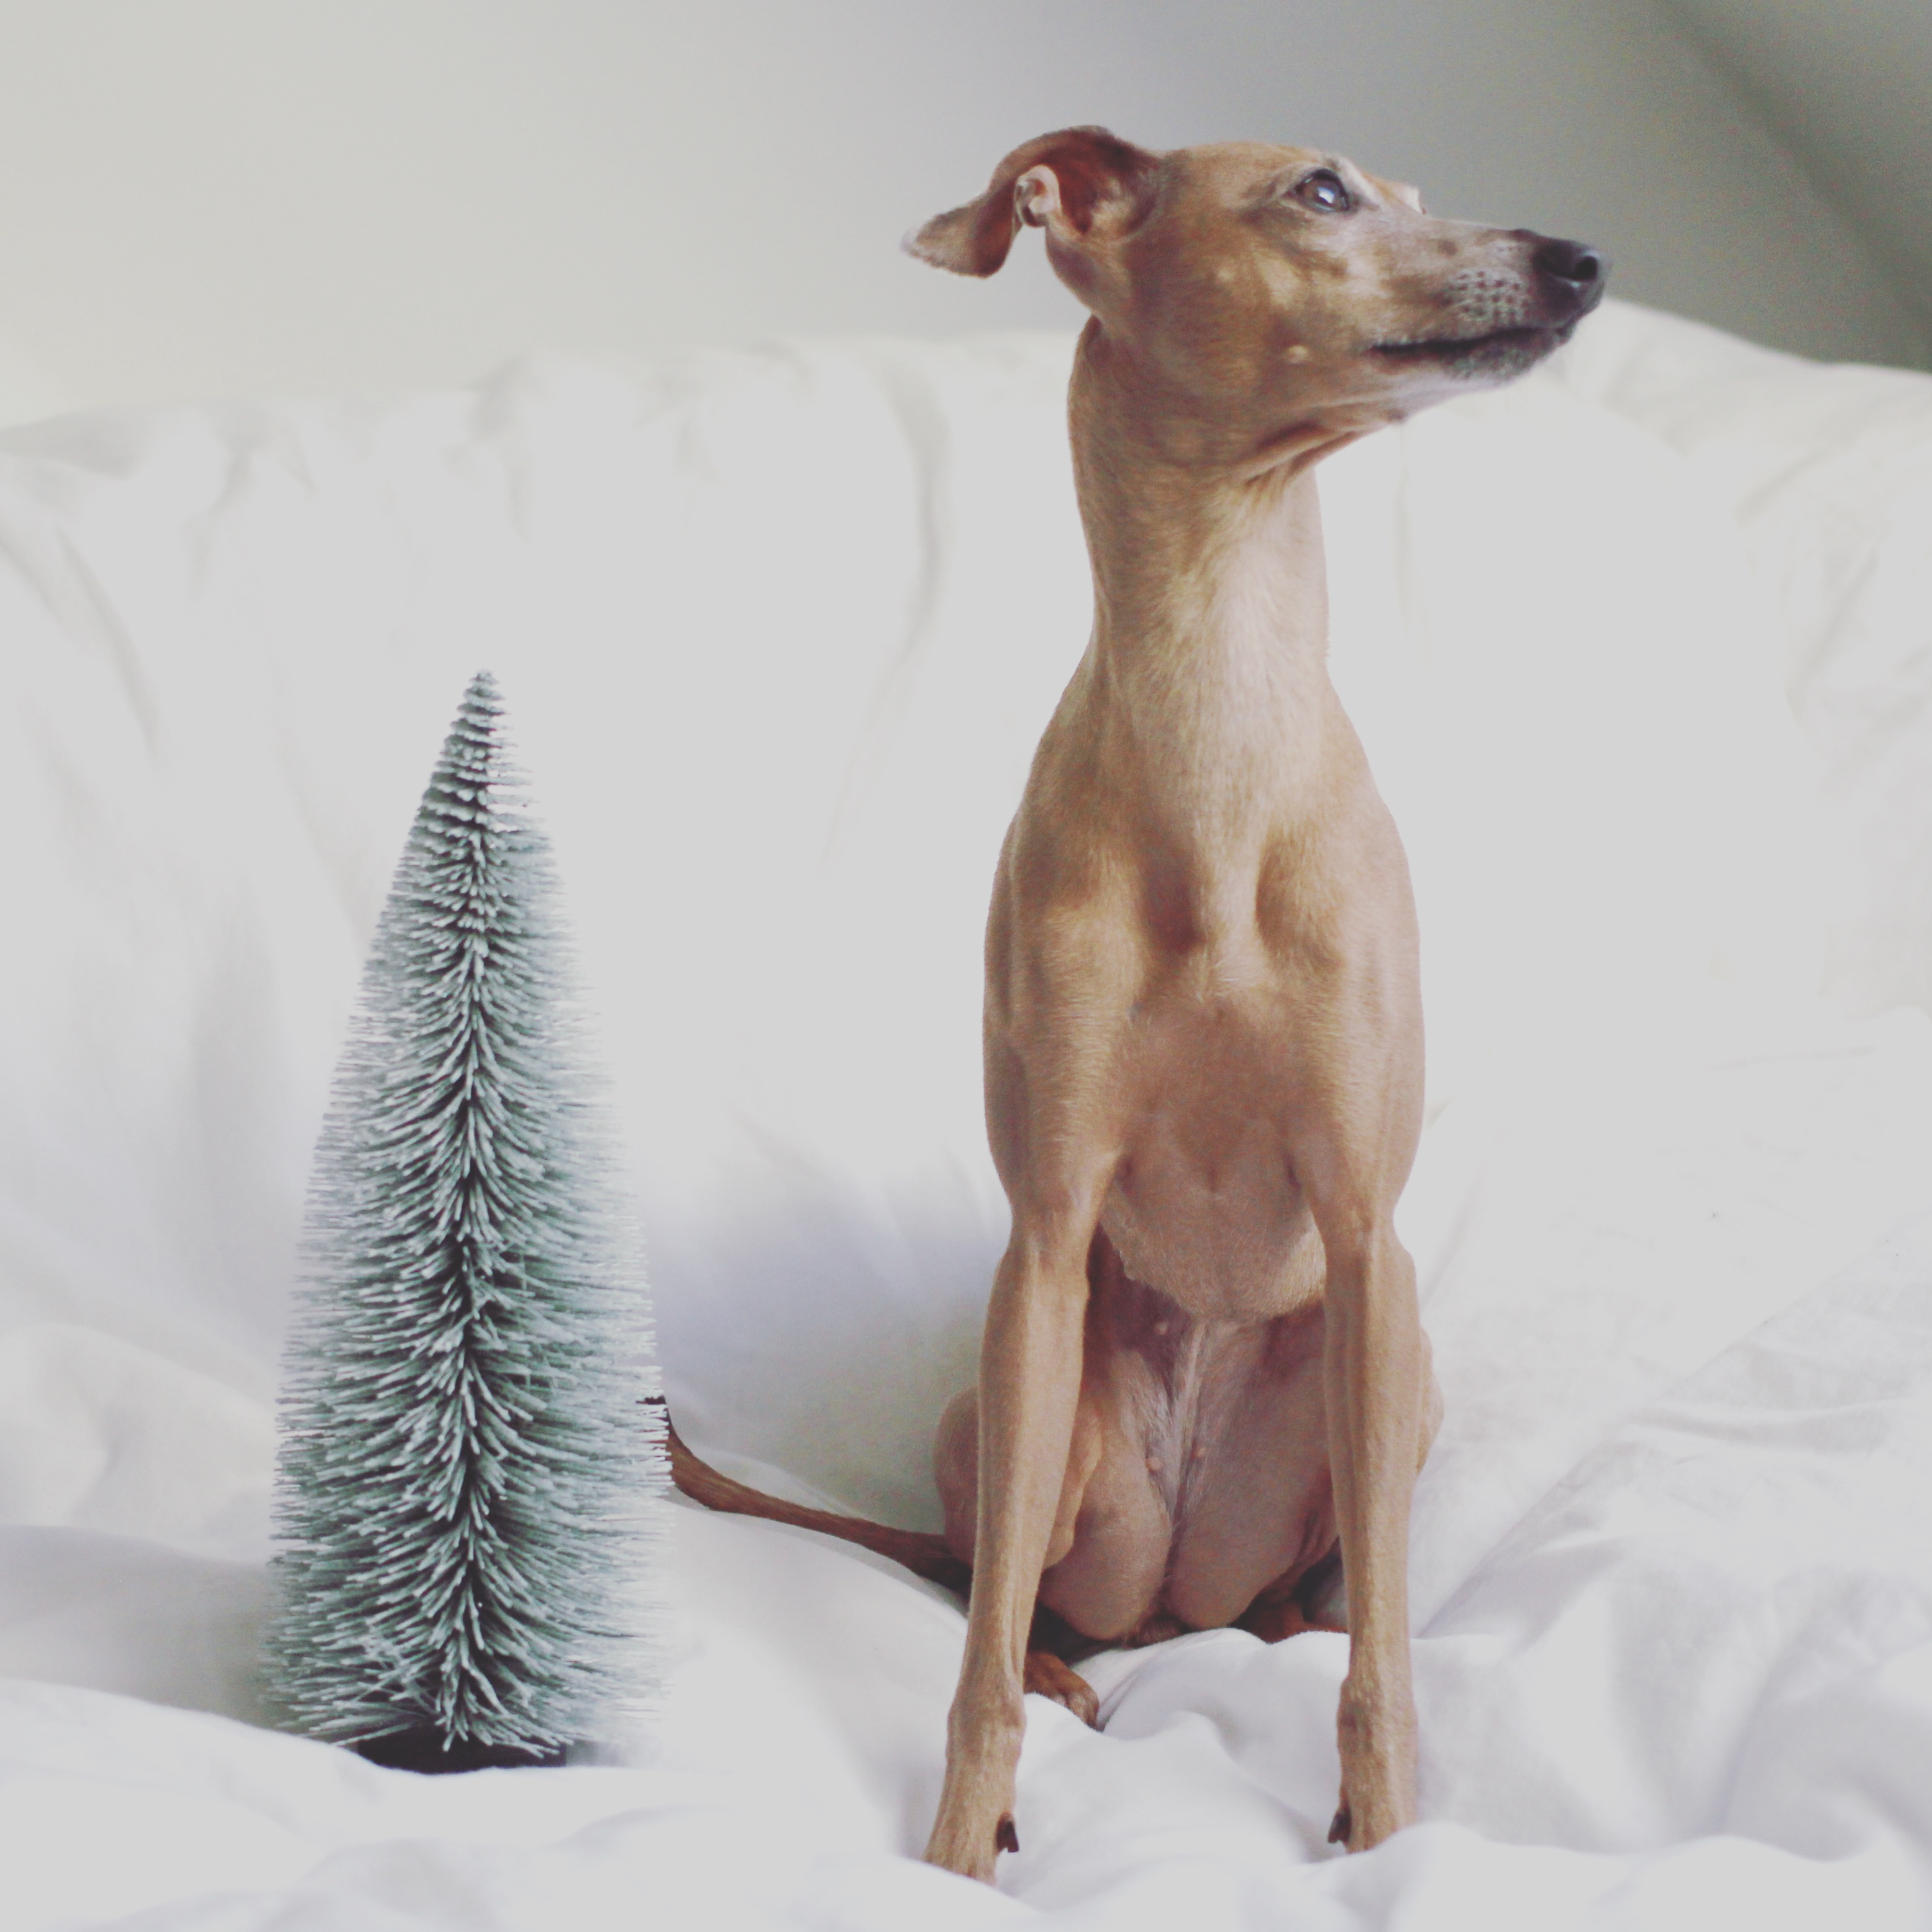 Samstag: Christmas? ...not yet...